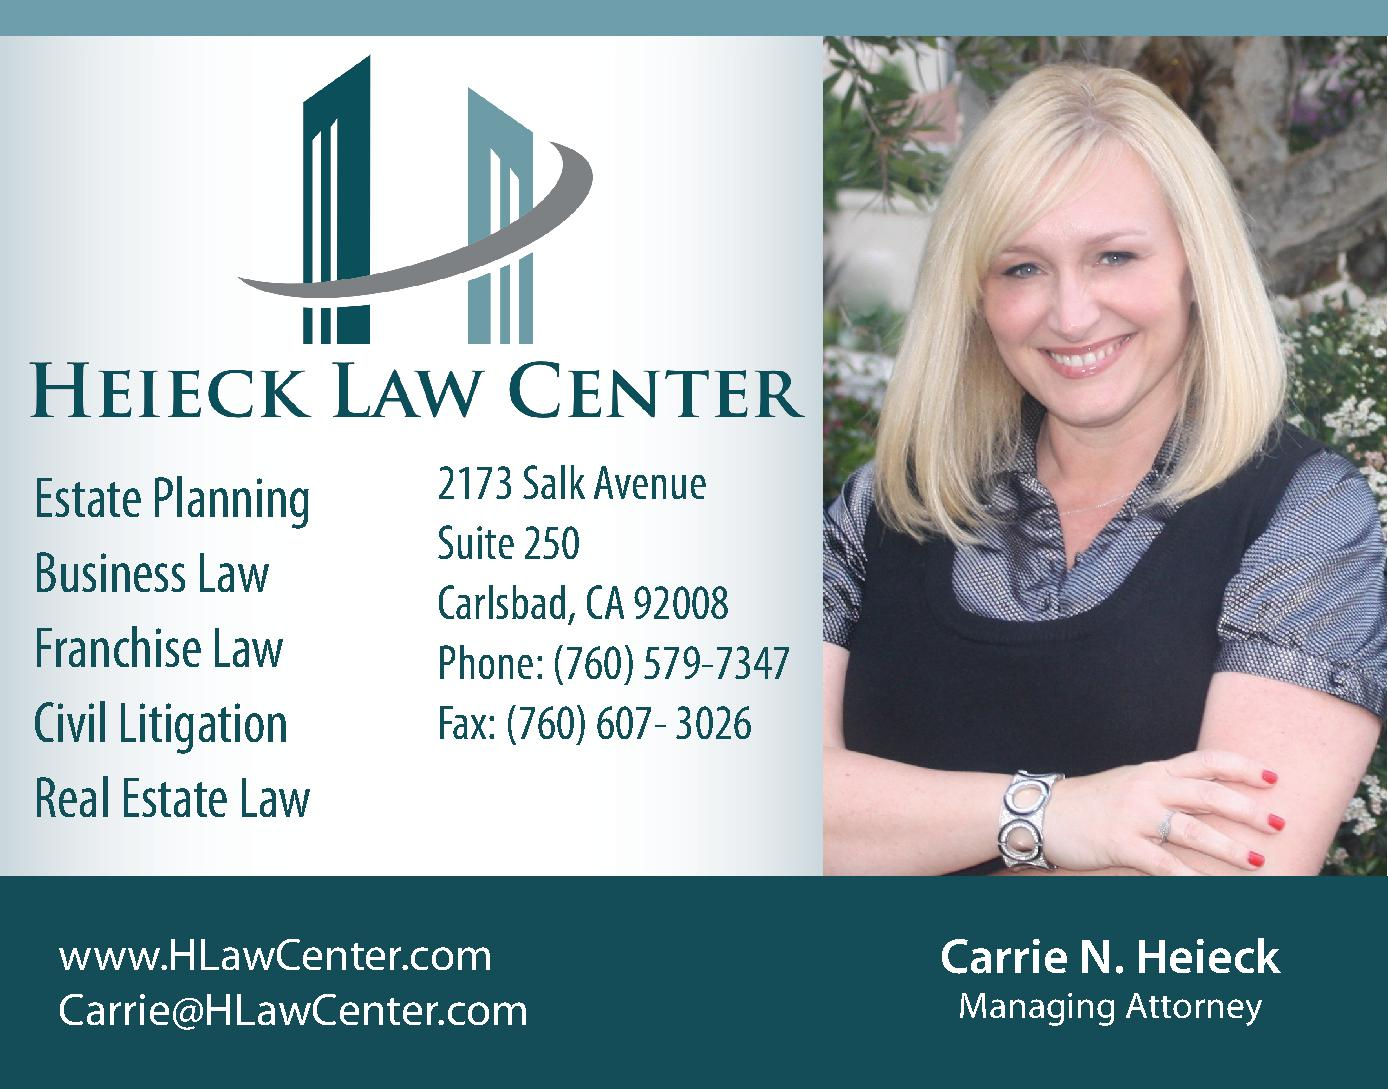 Heieck Law Center